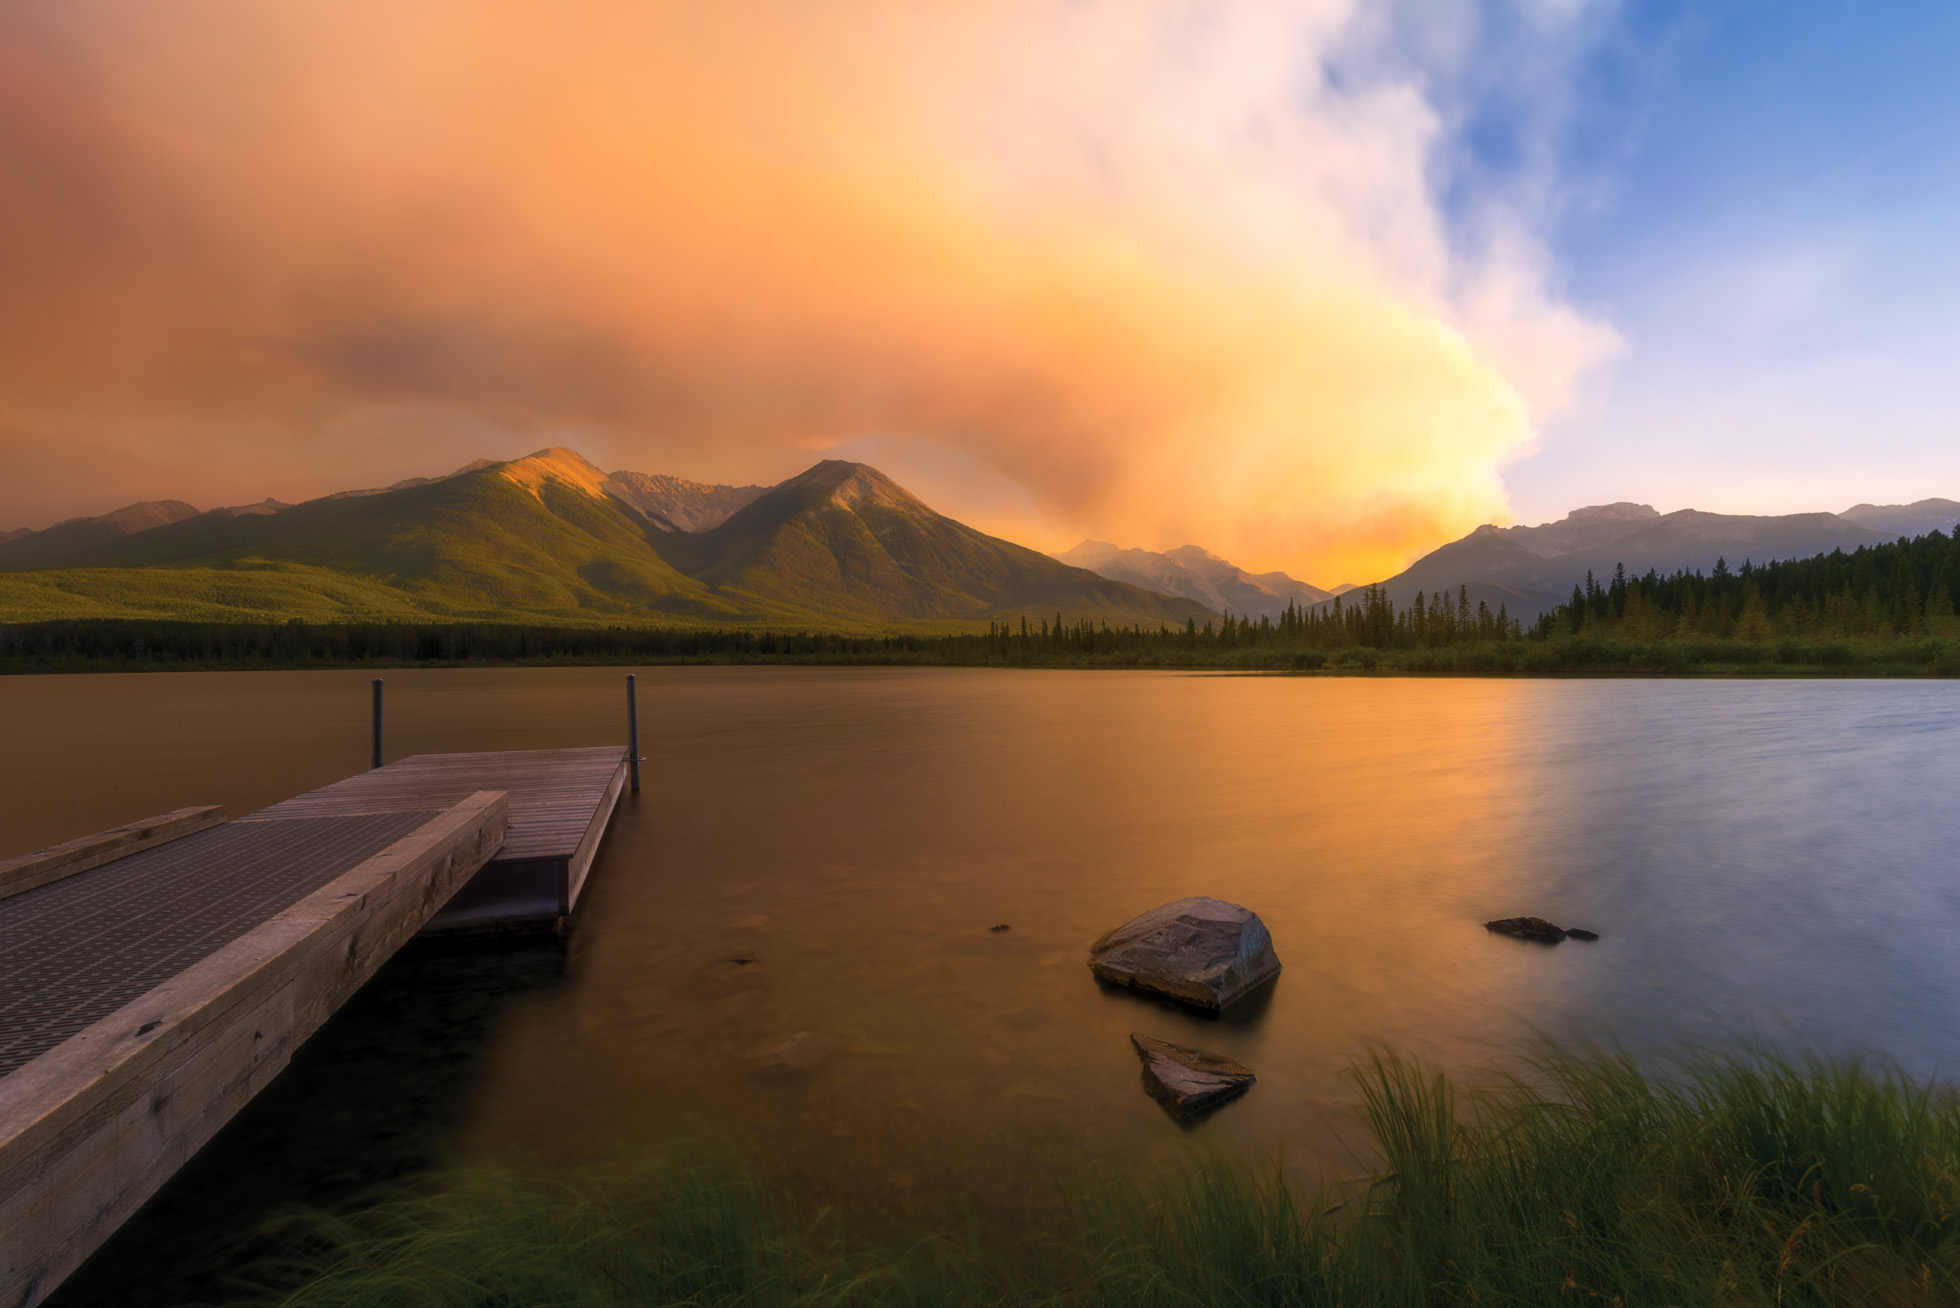 Smokey evening at Vermilion Lakes